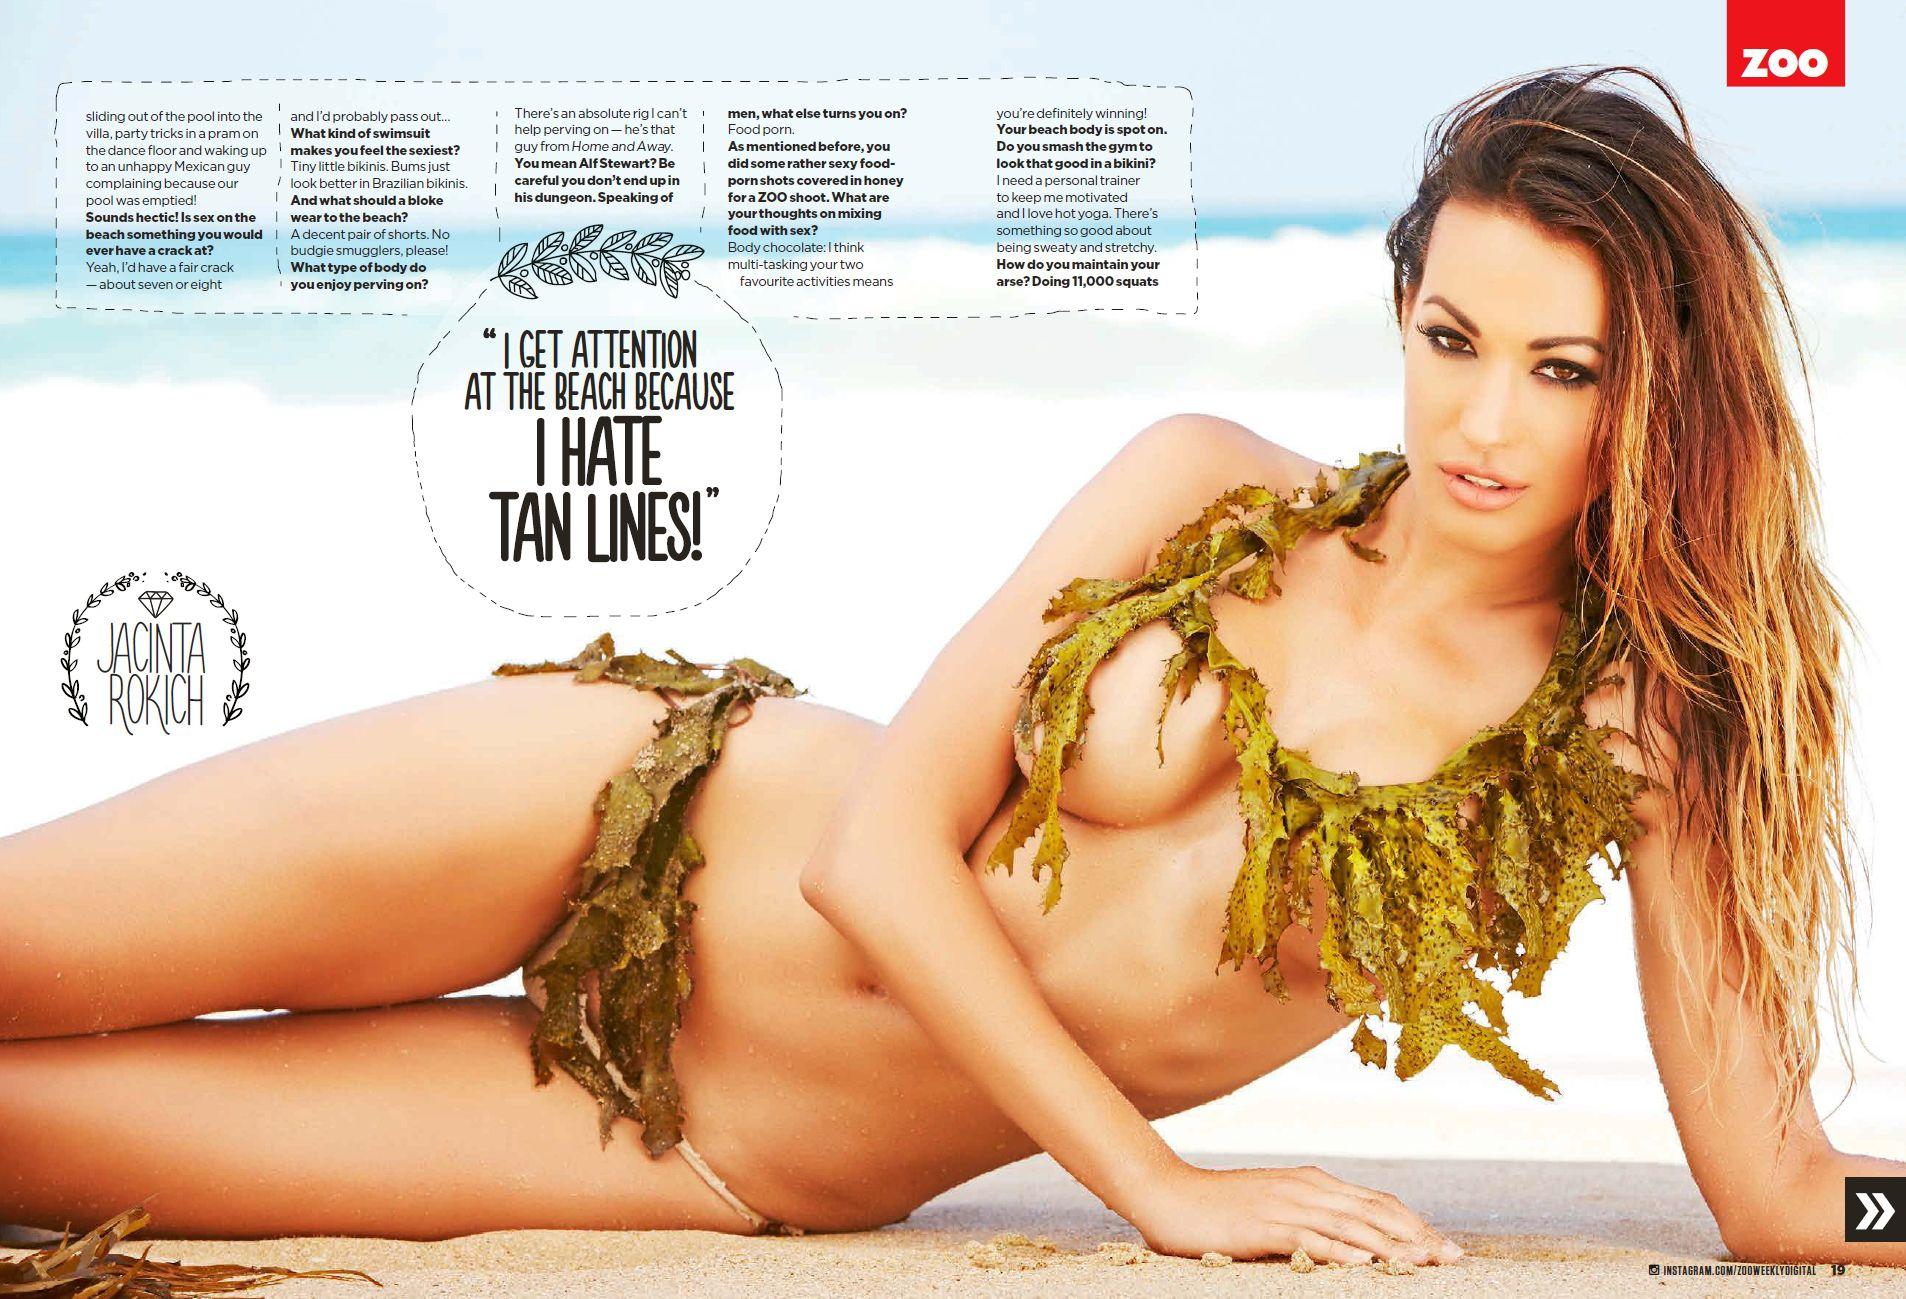 Jacinta Rokich nude (34 photo), Sexy, Sideboobs, Twitter, cleavage 2015